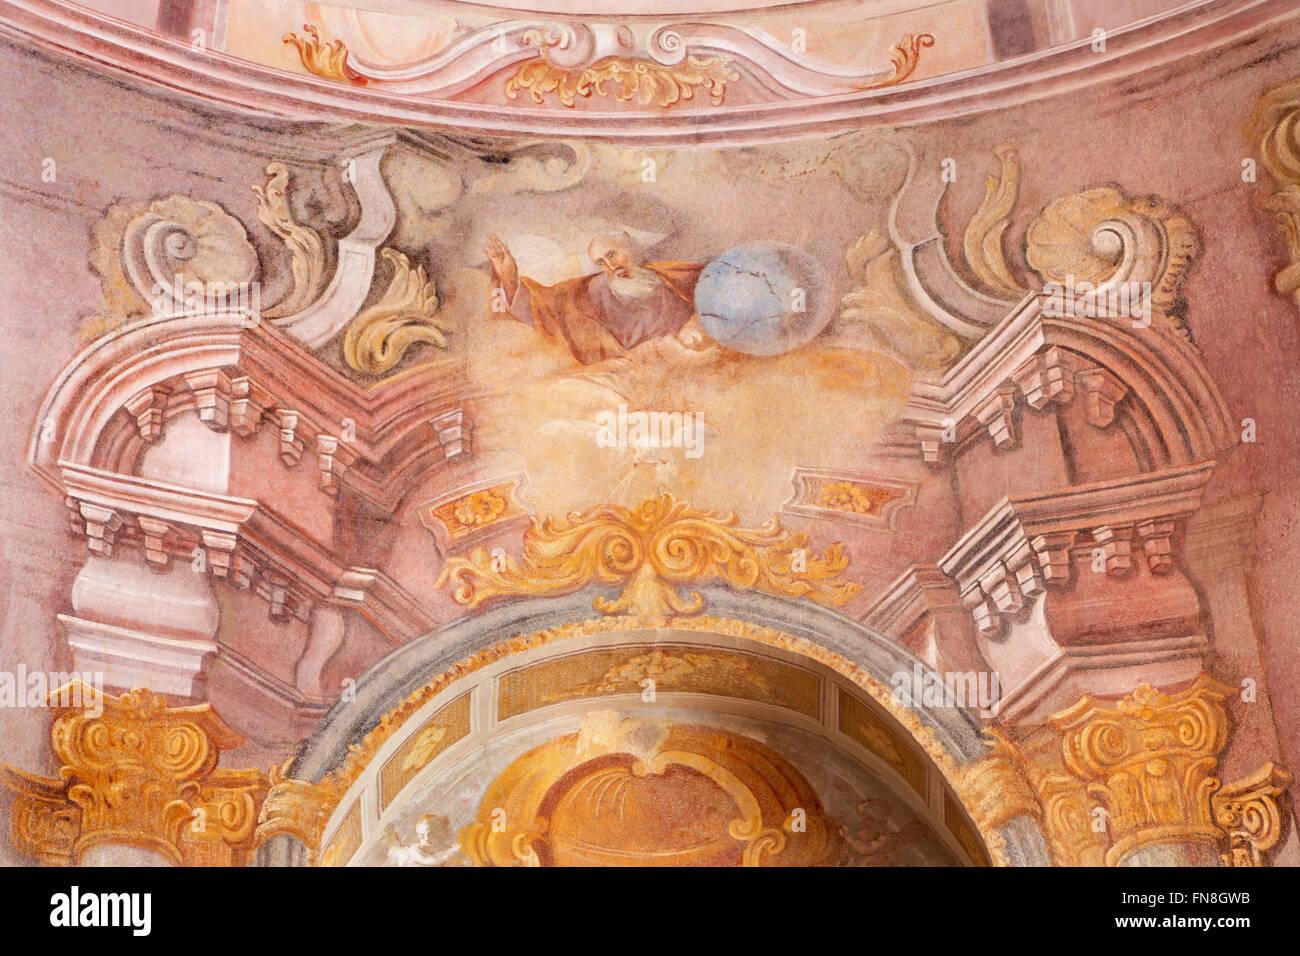 BANSKA STIAVNICA, SLOVAKIA - FEBRUARY 20, 2015: The God the Creator fresco in the middle church of baroque calvary. - Stock Image